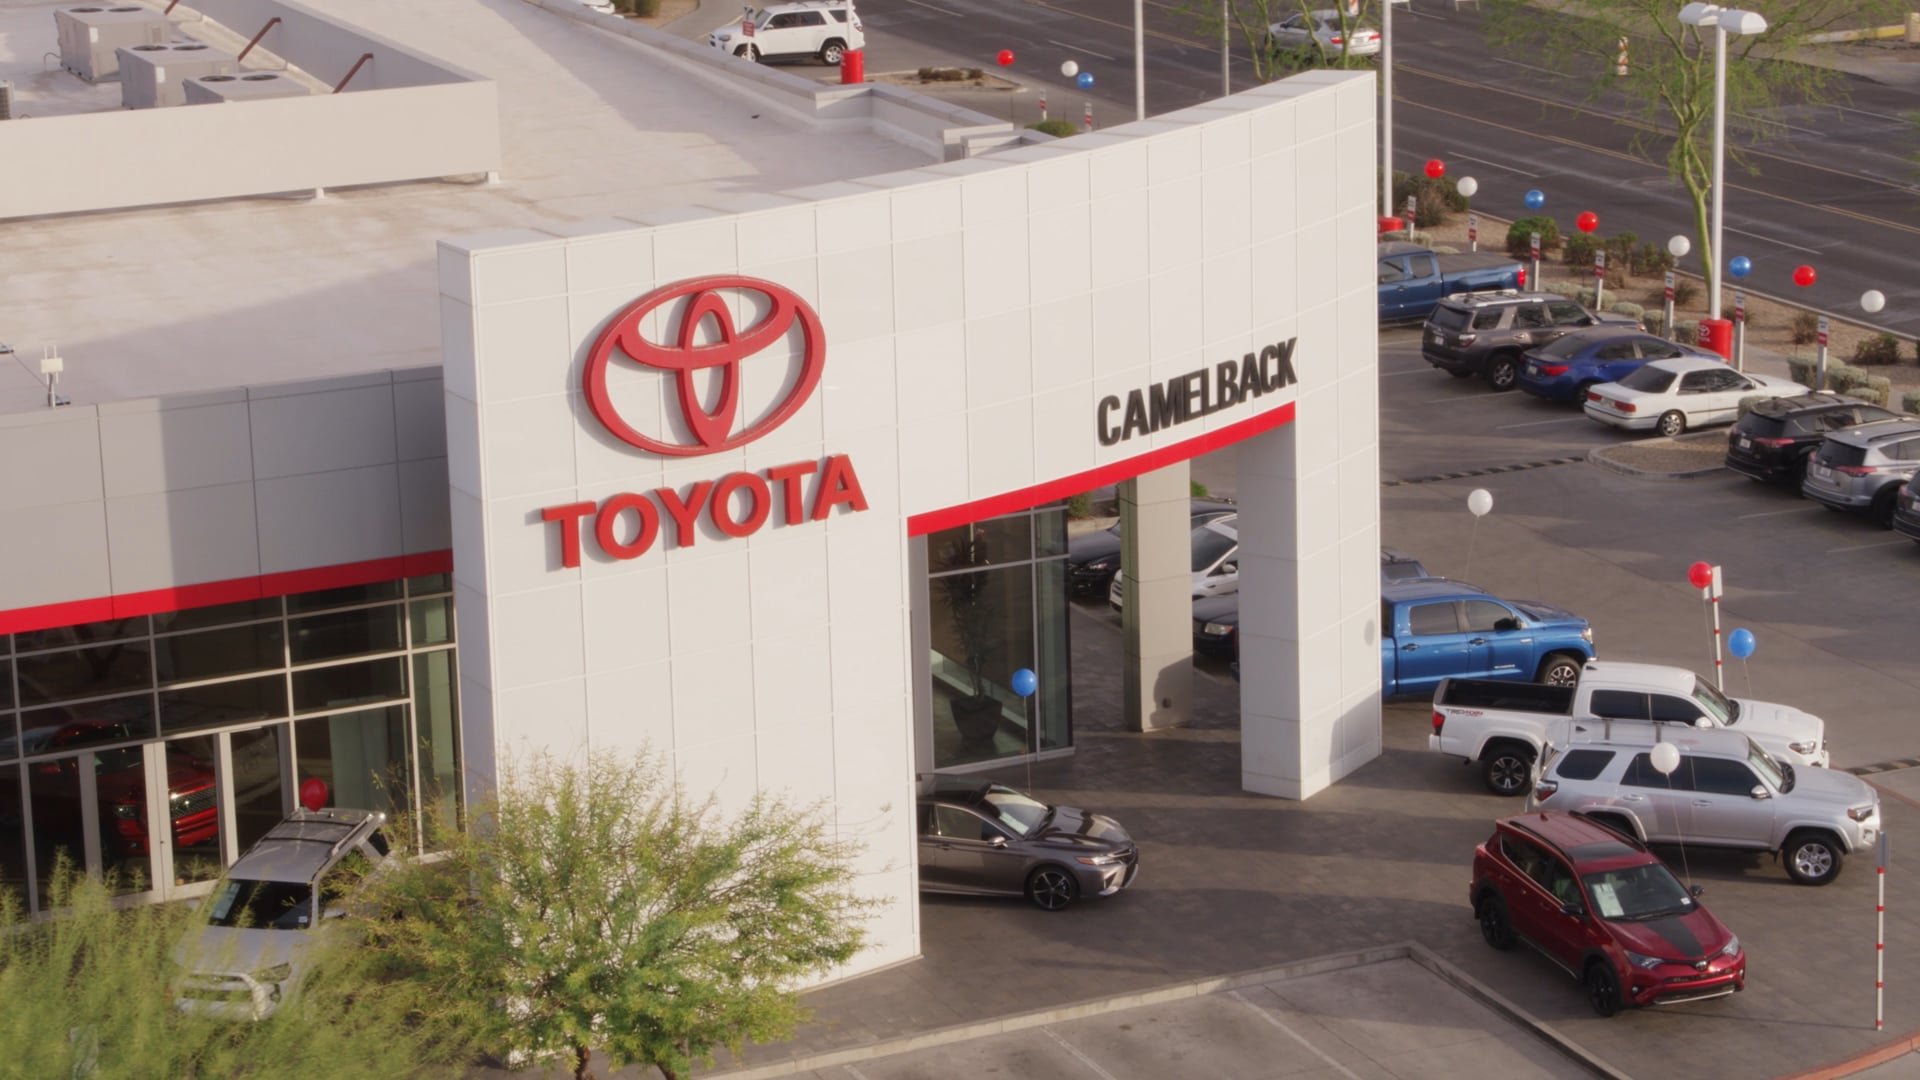 Camelback Toyota Promo Trailer